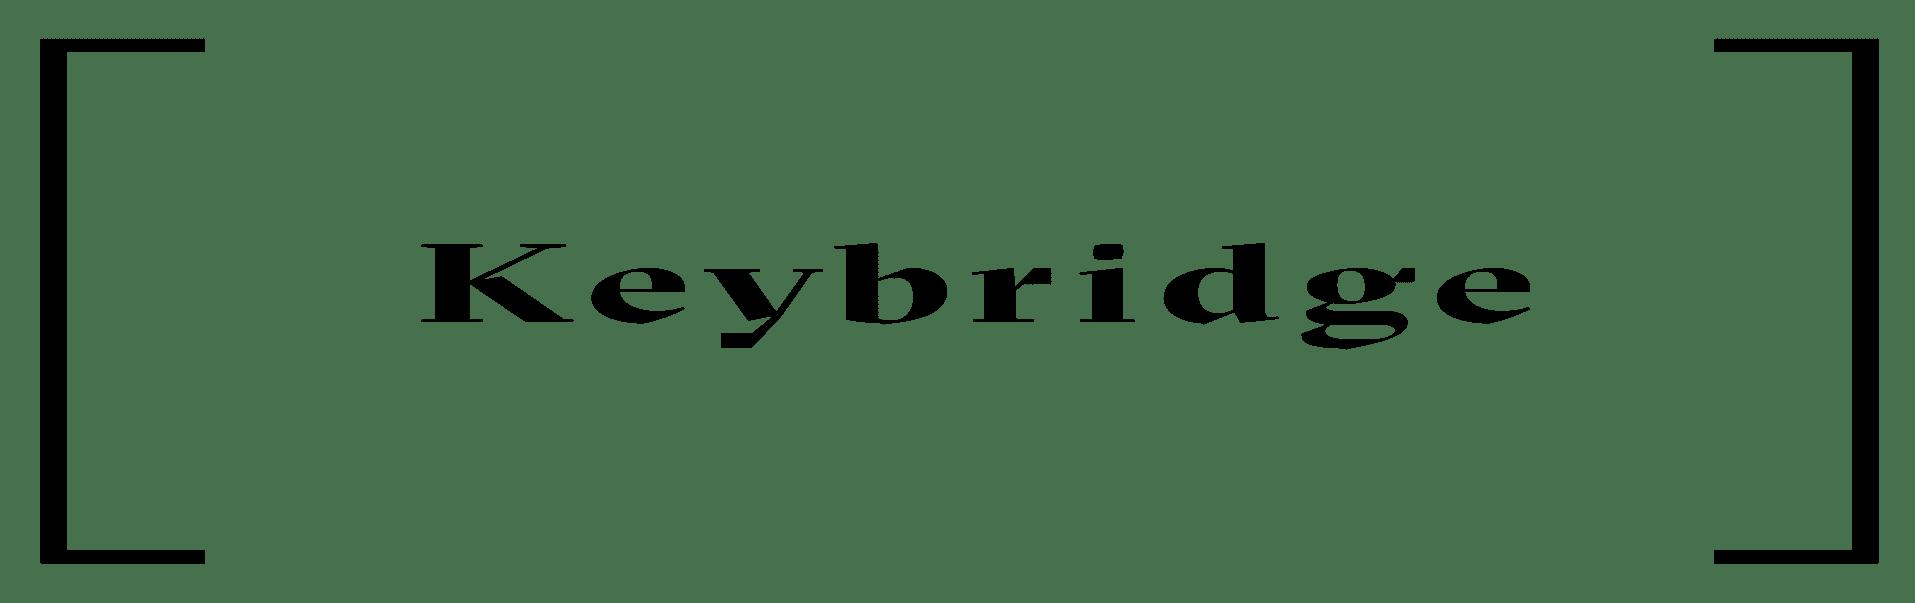 Keybridge in Vauxhall